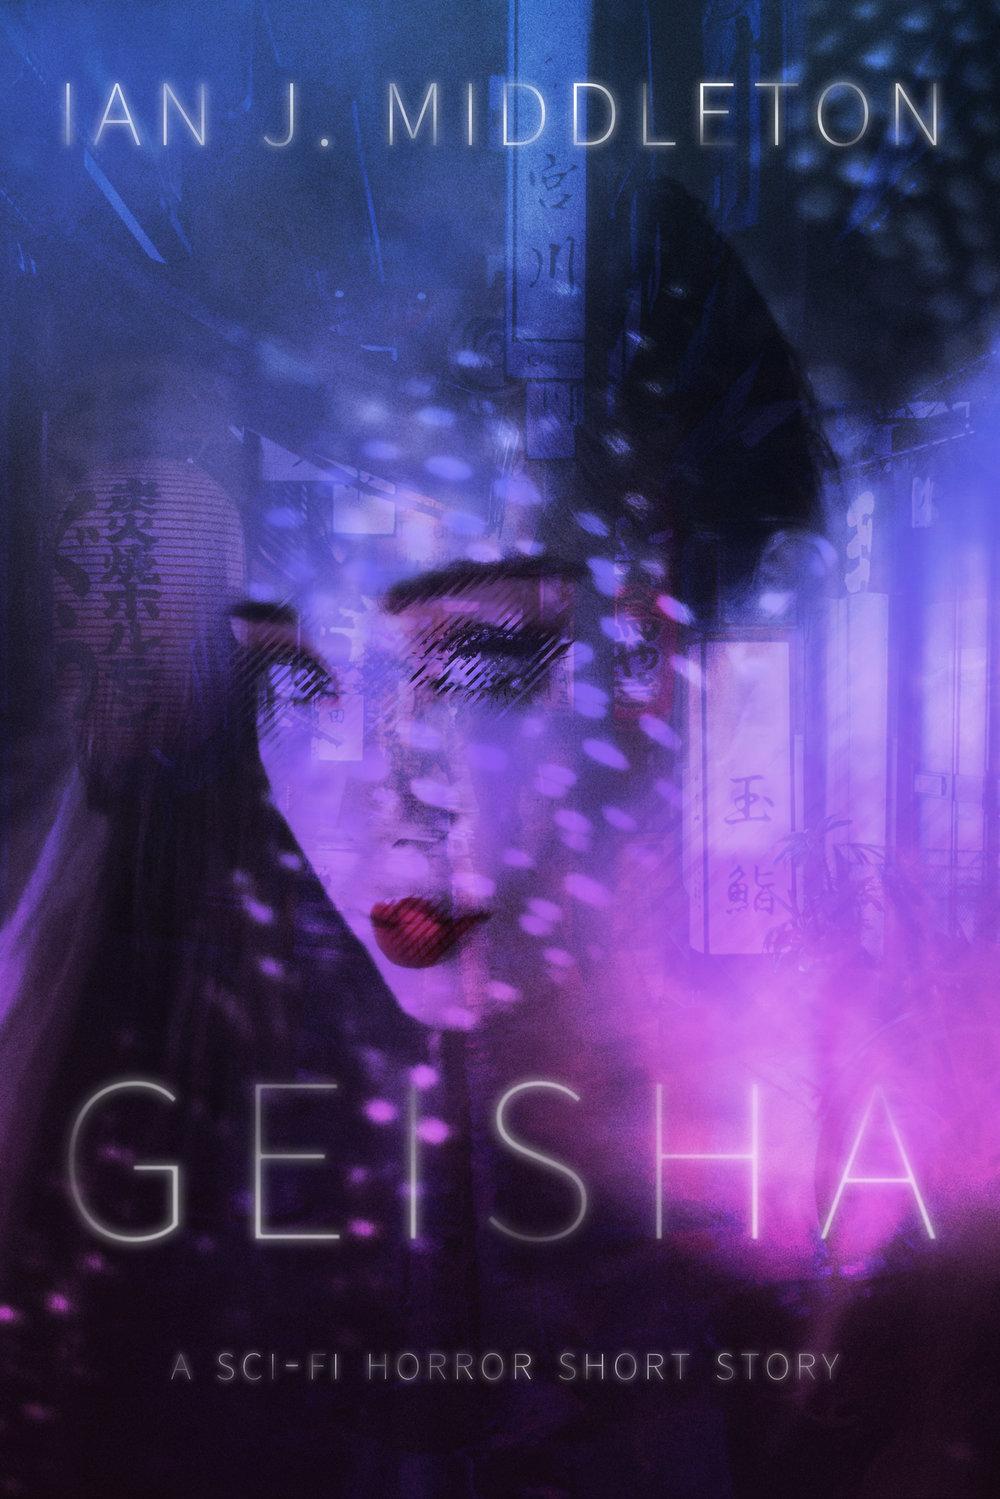 Ian J. Middleton Geisha Short Story